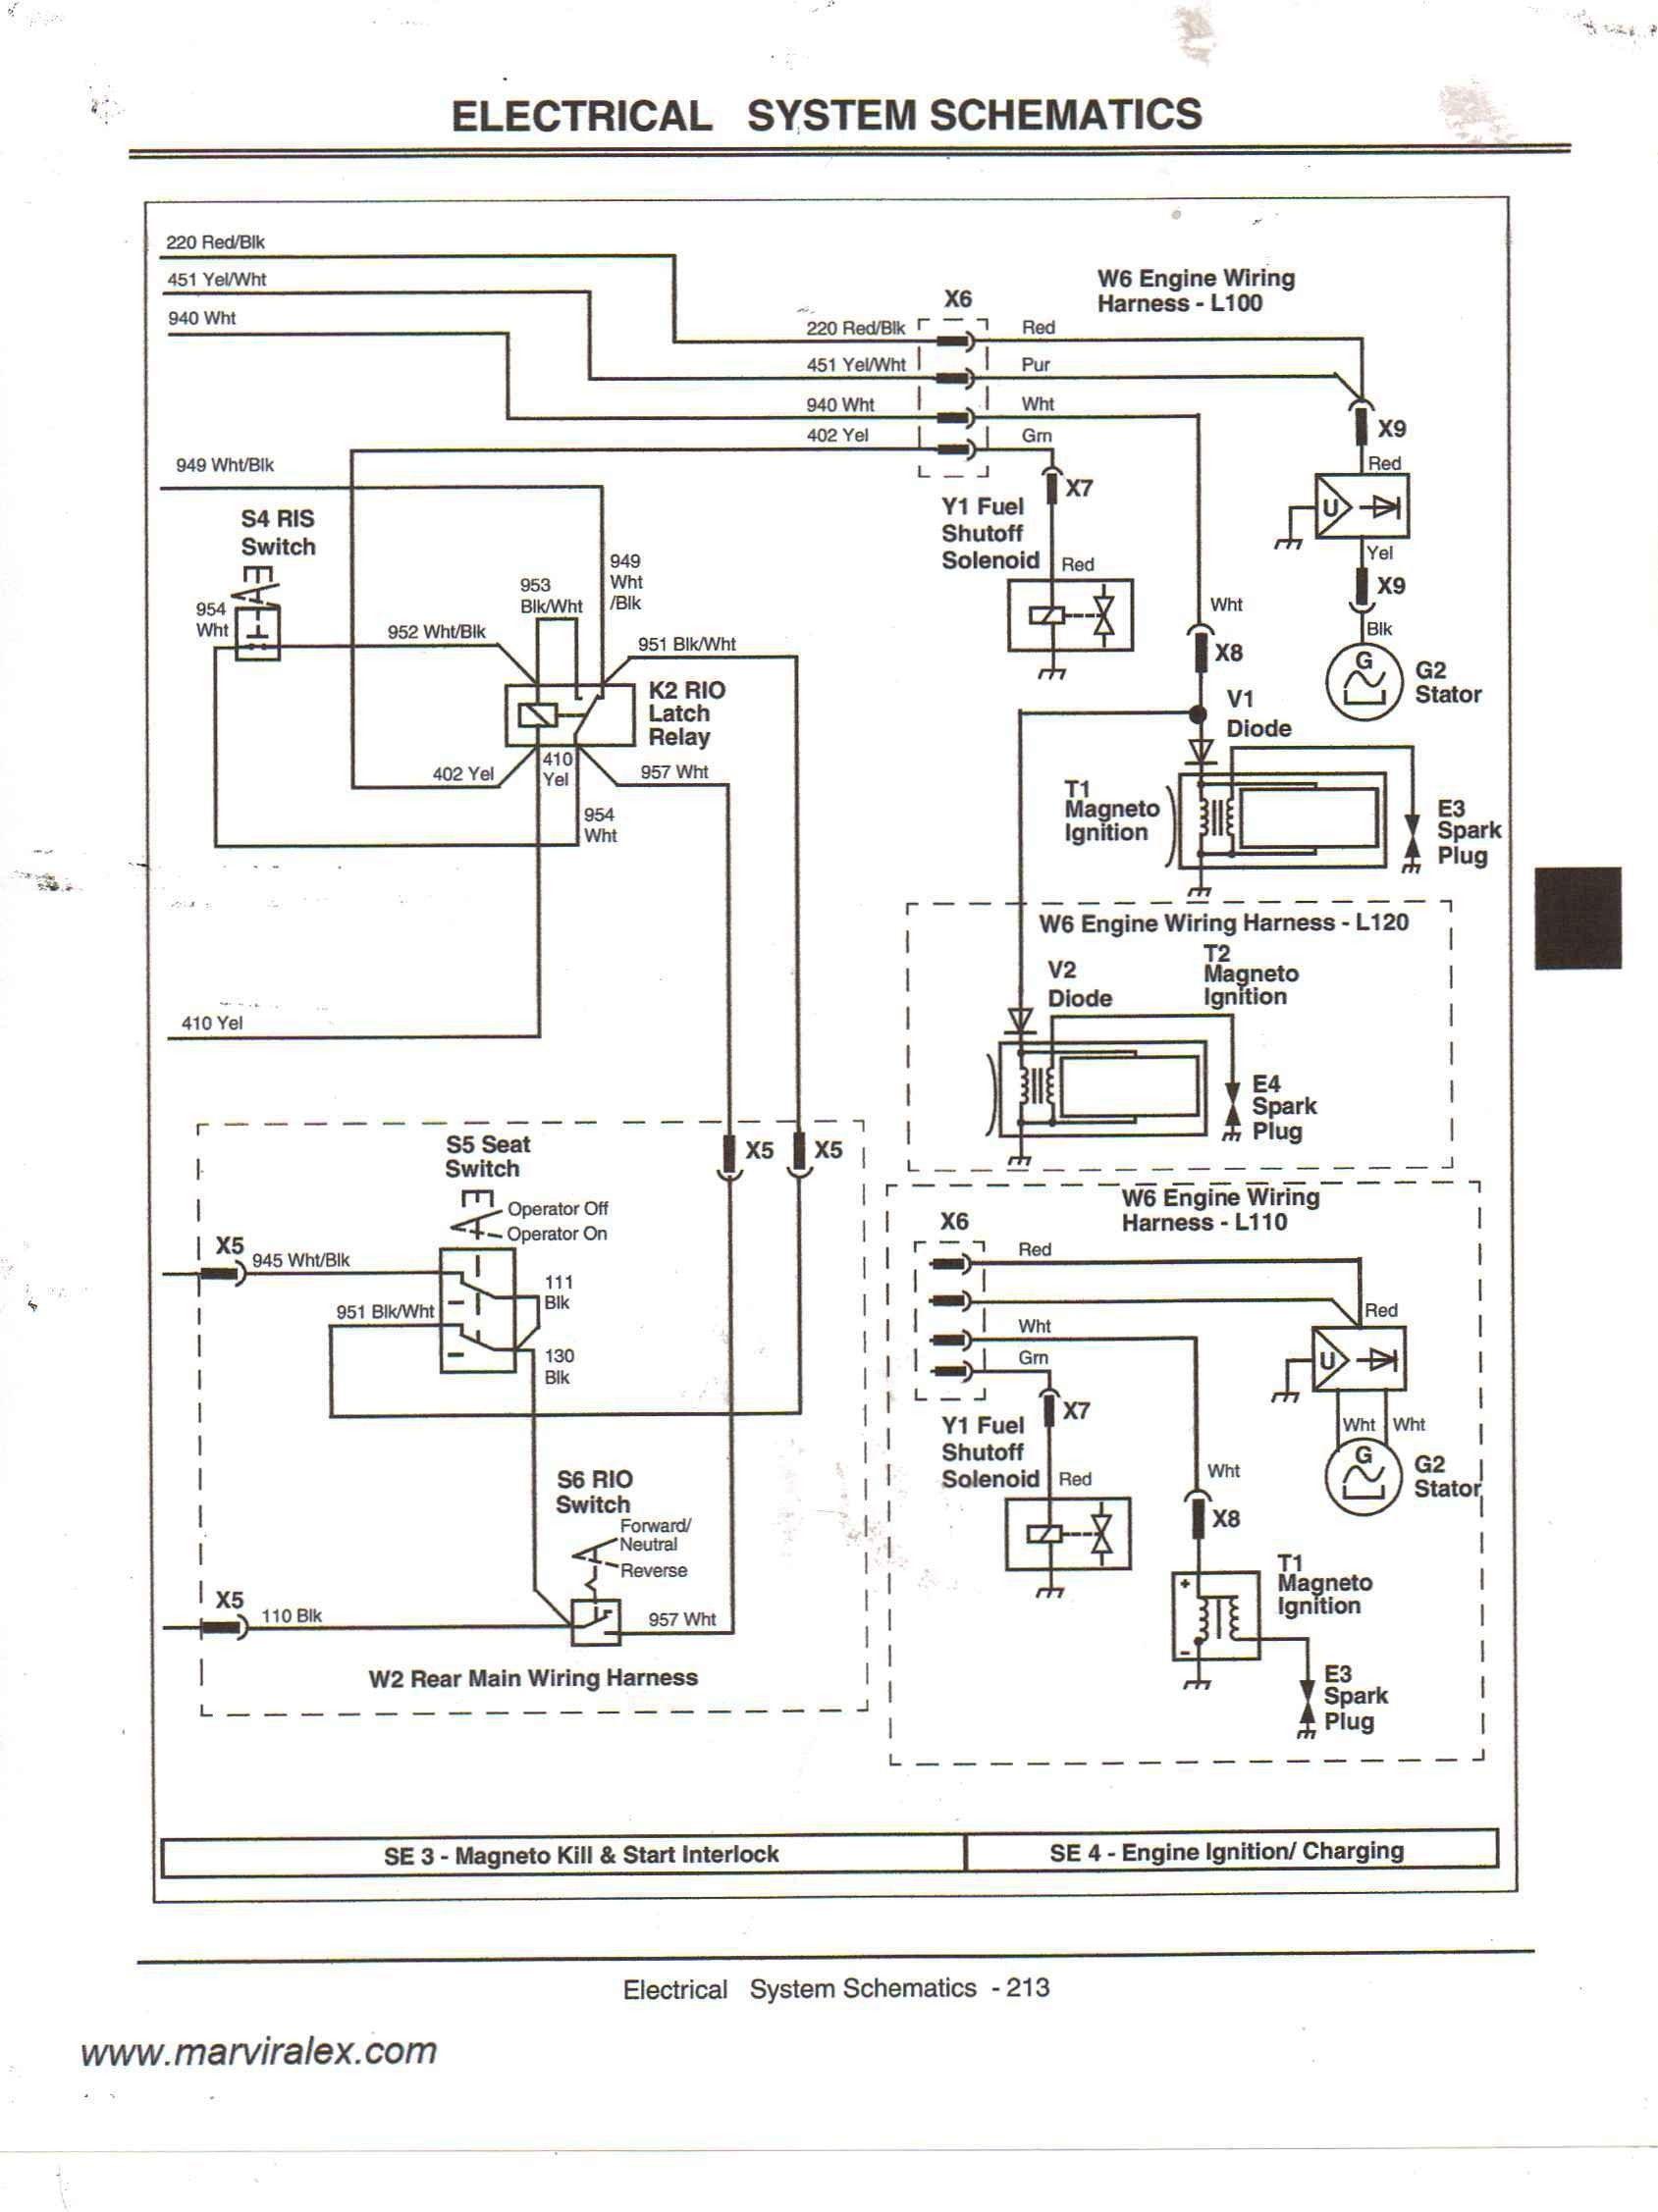 medium resolution of limitorque wiring diagrams wd mxa 01000 0100 wiring diagram database 110v schematic wiring diagram free download